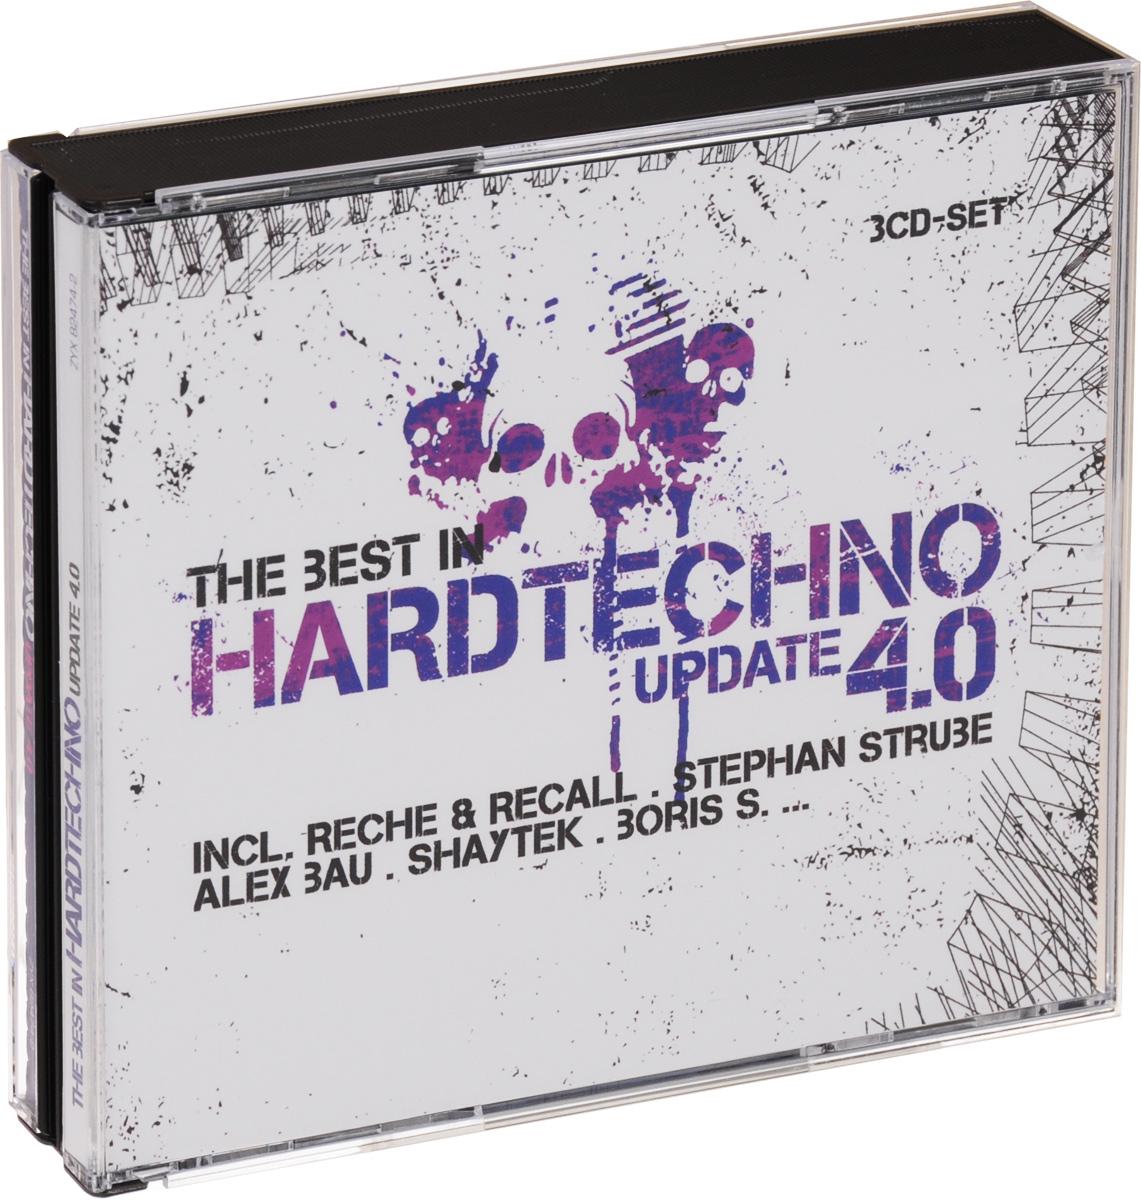 The Best In Hardtechno. Update 4.0 (3 CD)